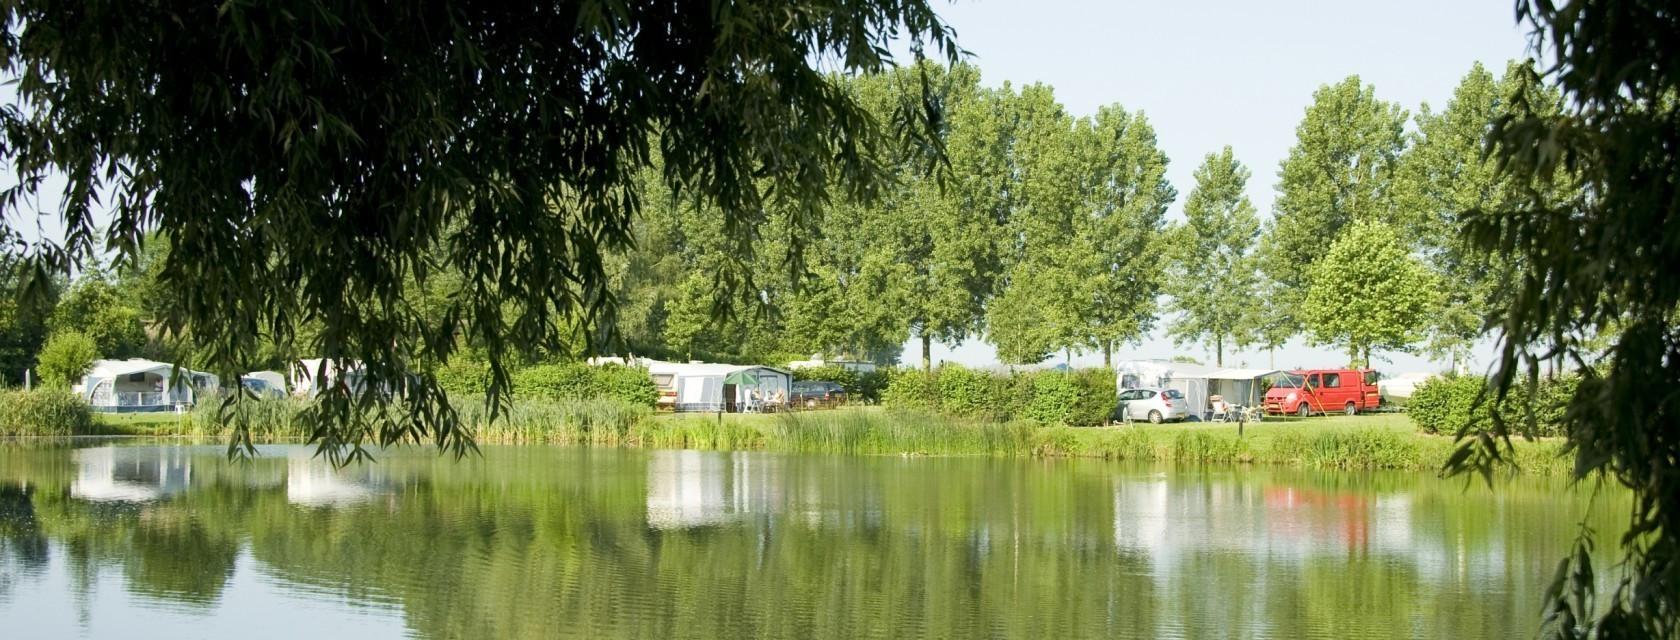 camping-at-the-water